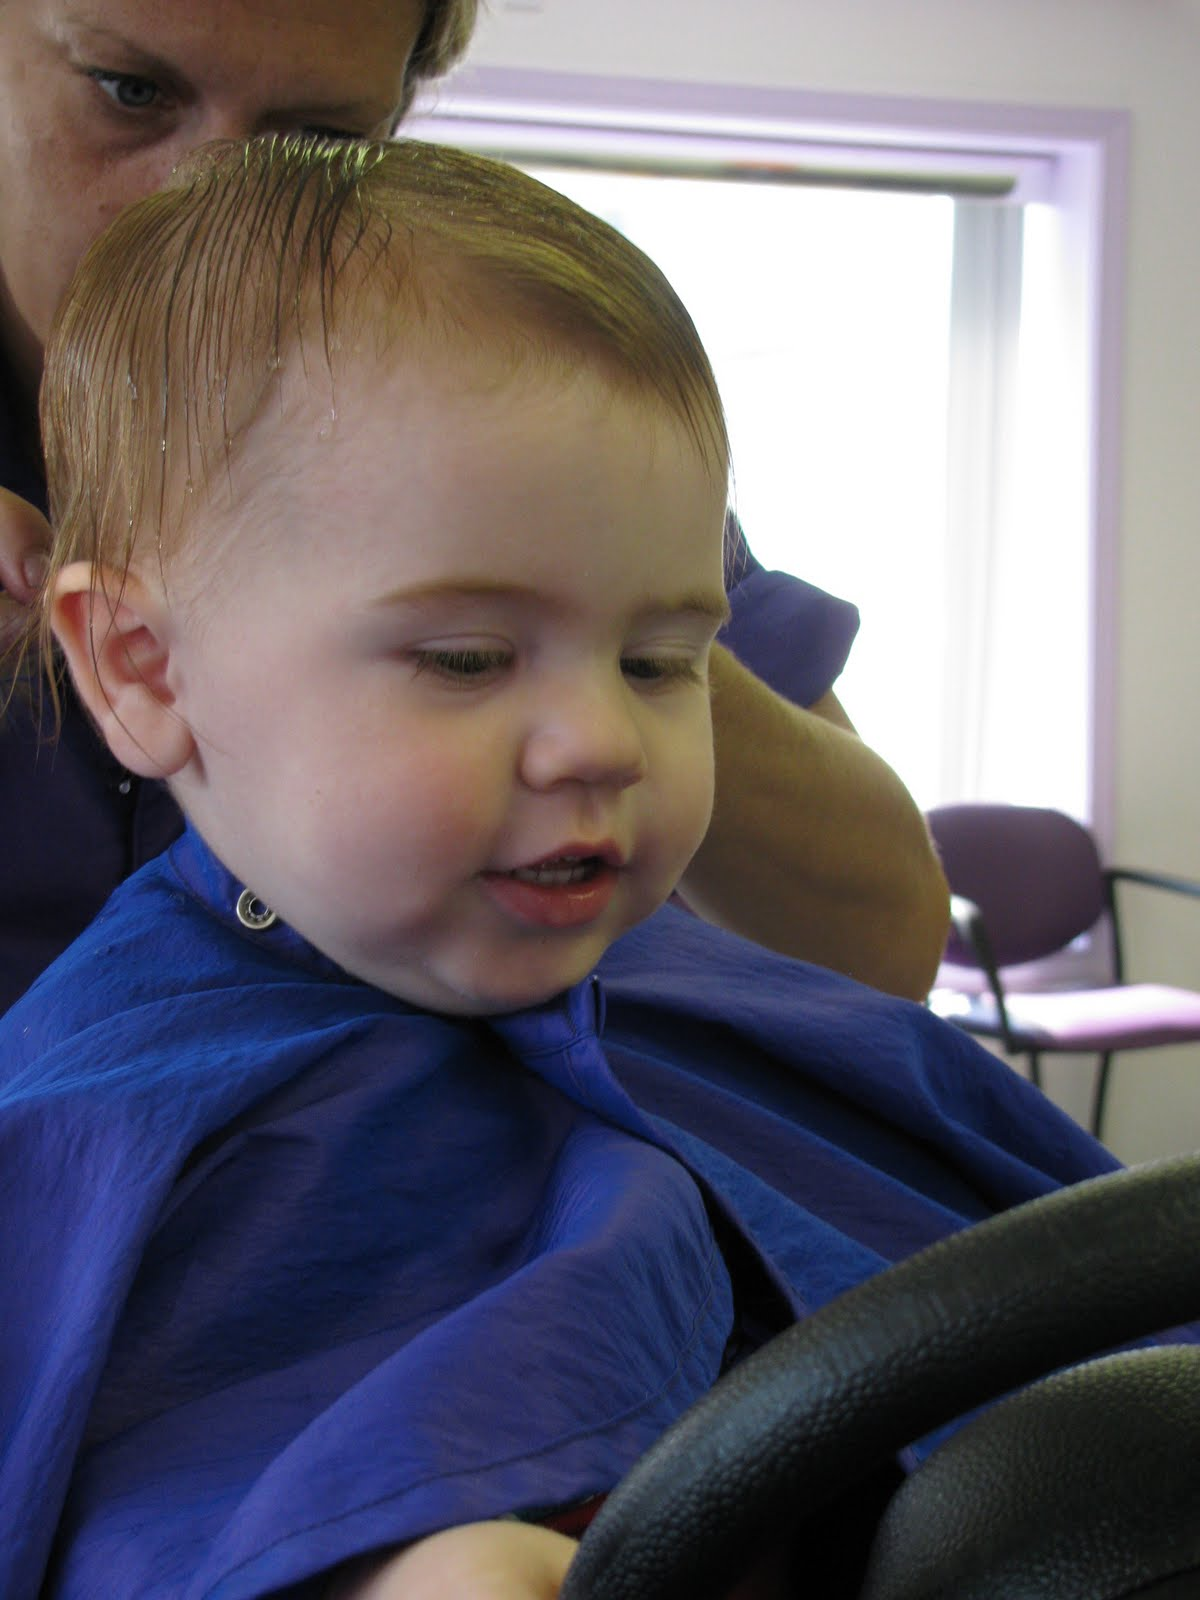 Mullet Mohawk Haircut First haircut